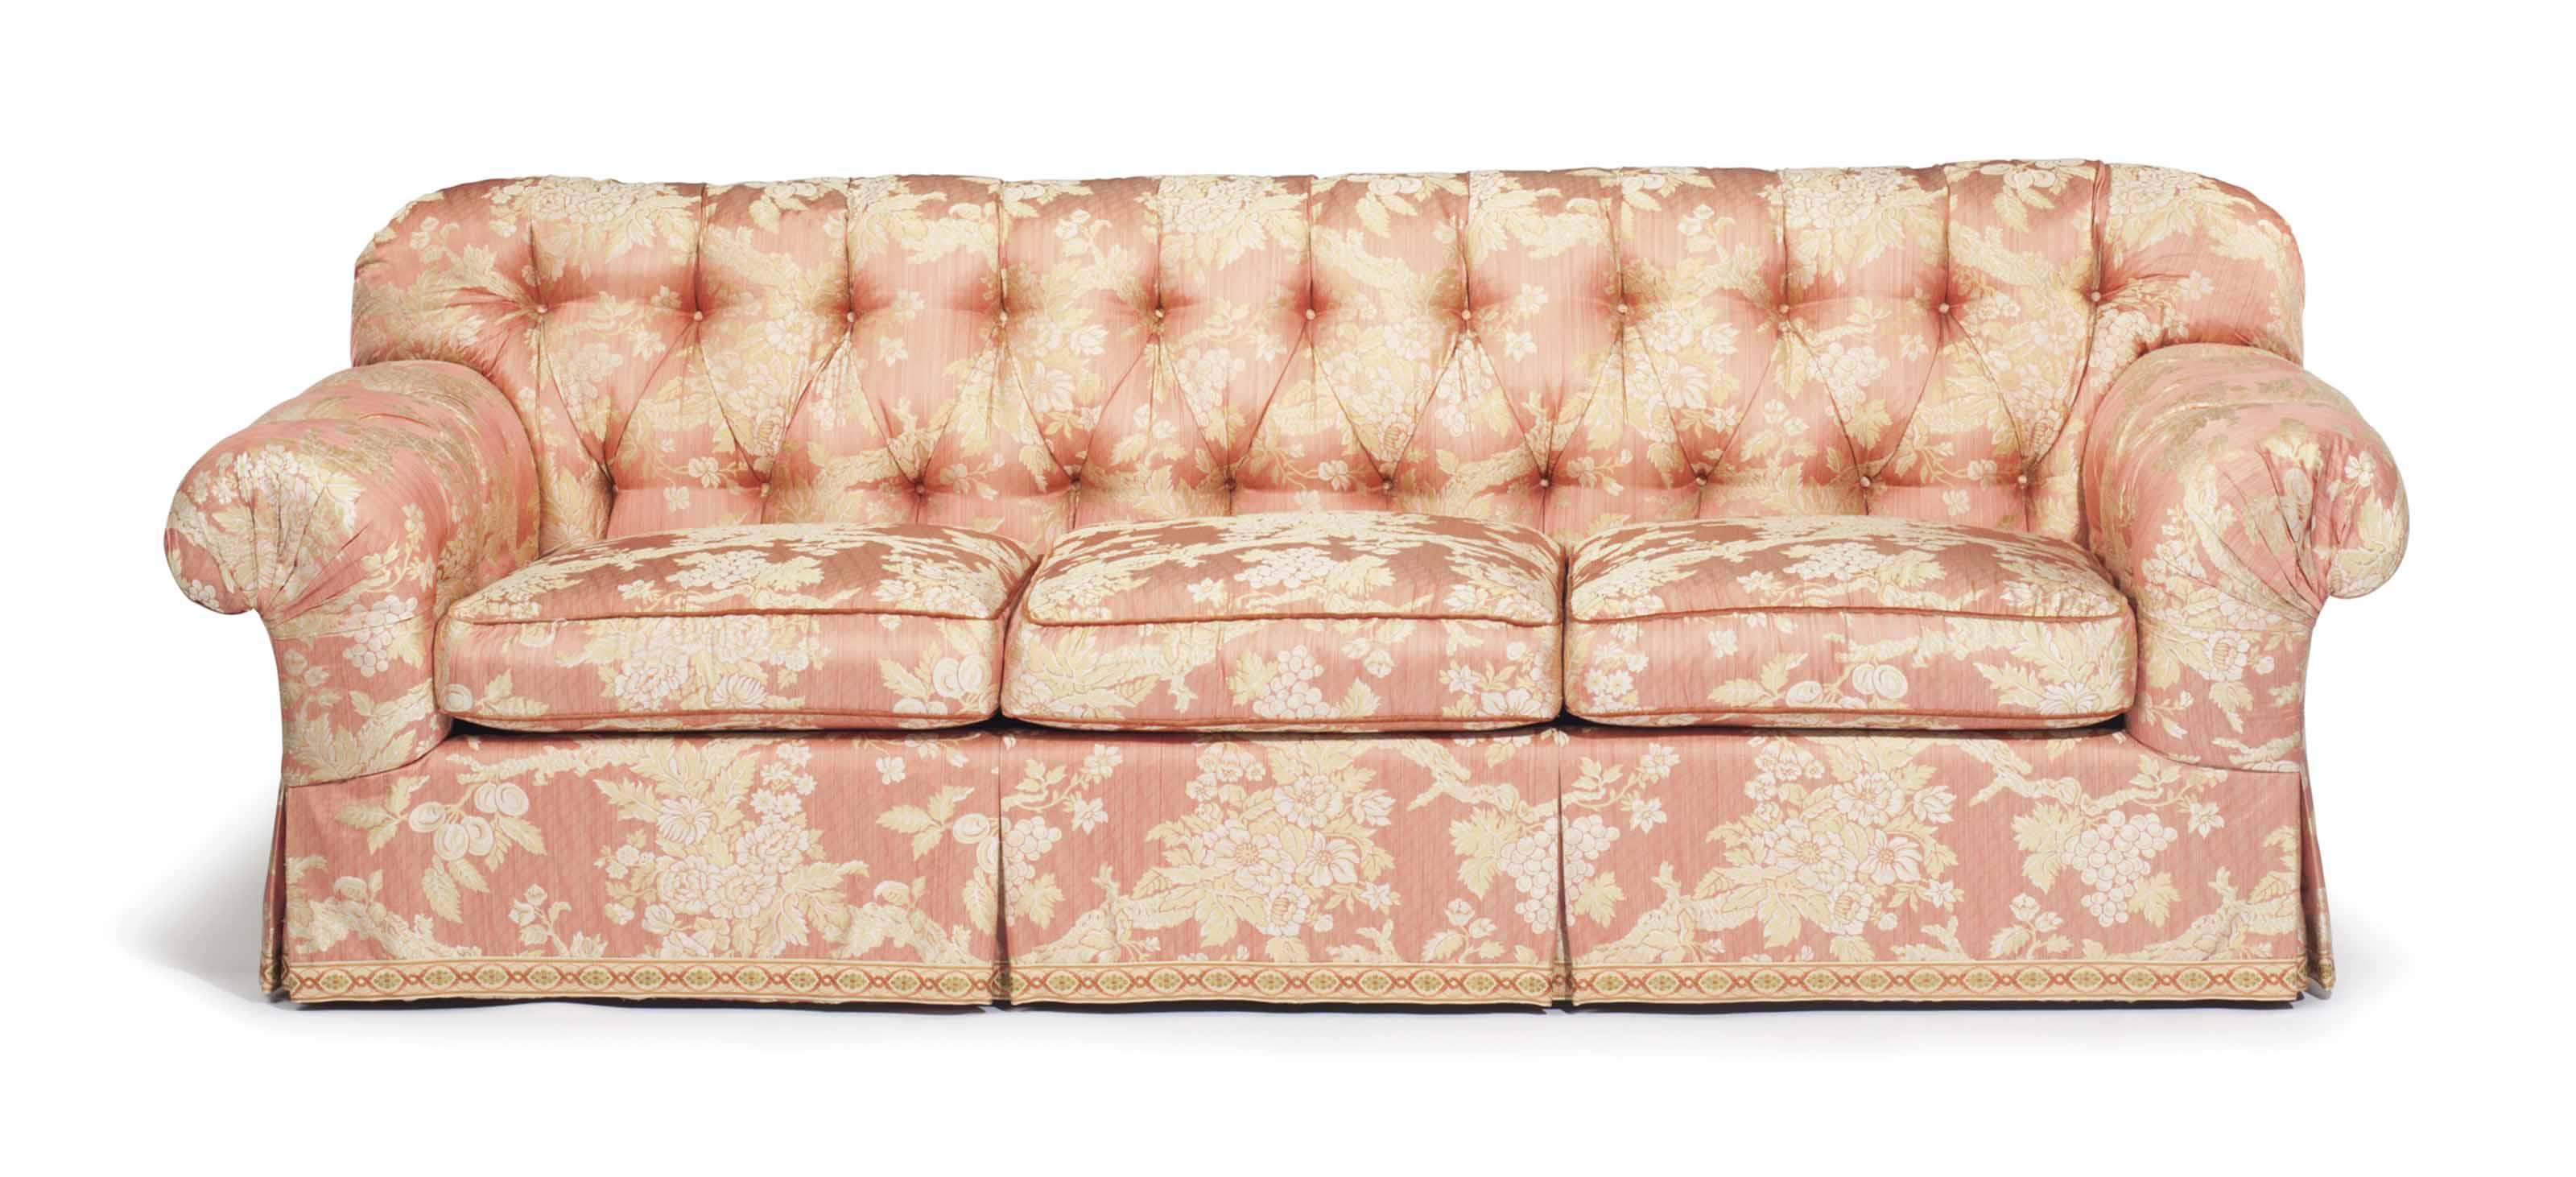 Beeindruckend Sofa Rose Beste Wahl Lot 97